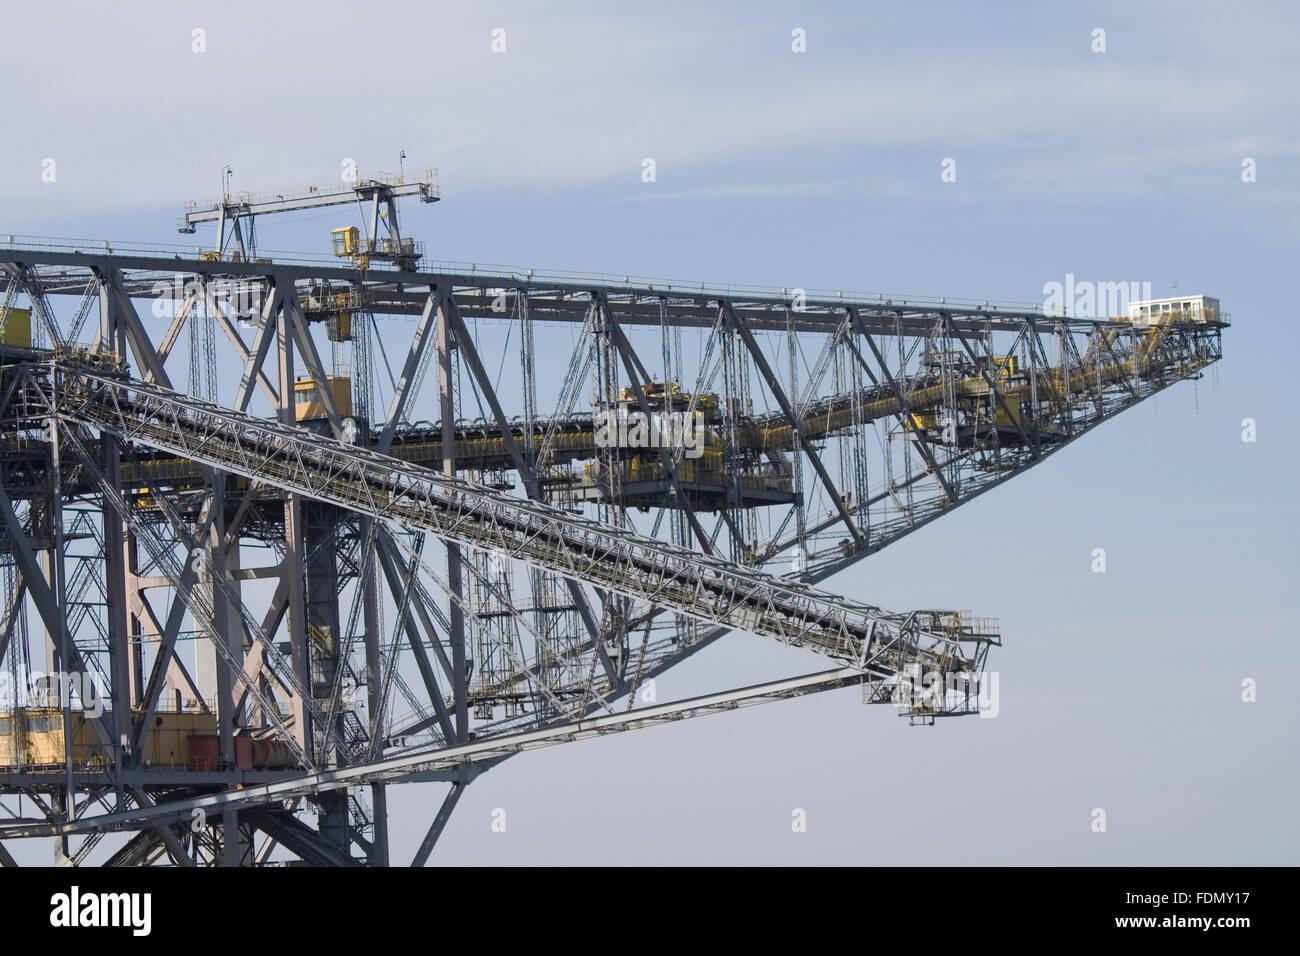 machine,opencast,conveyor bridge - Stock Image